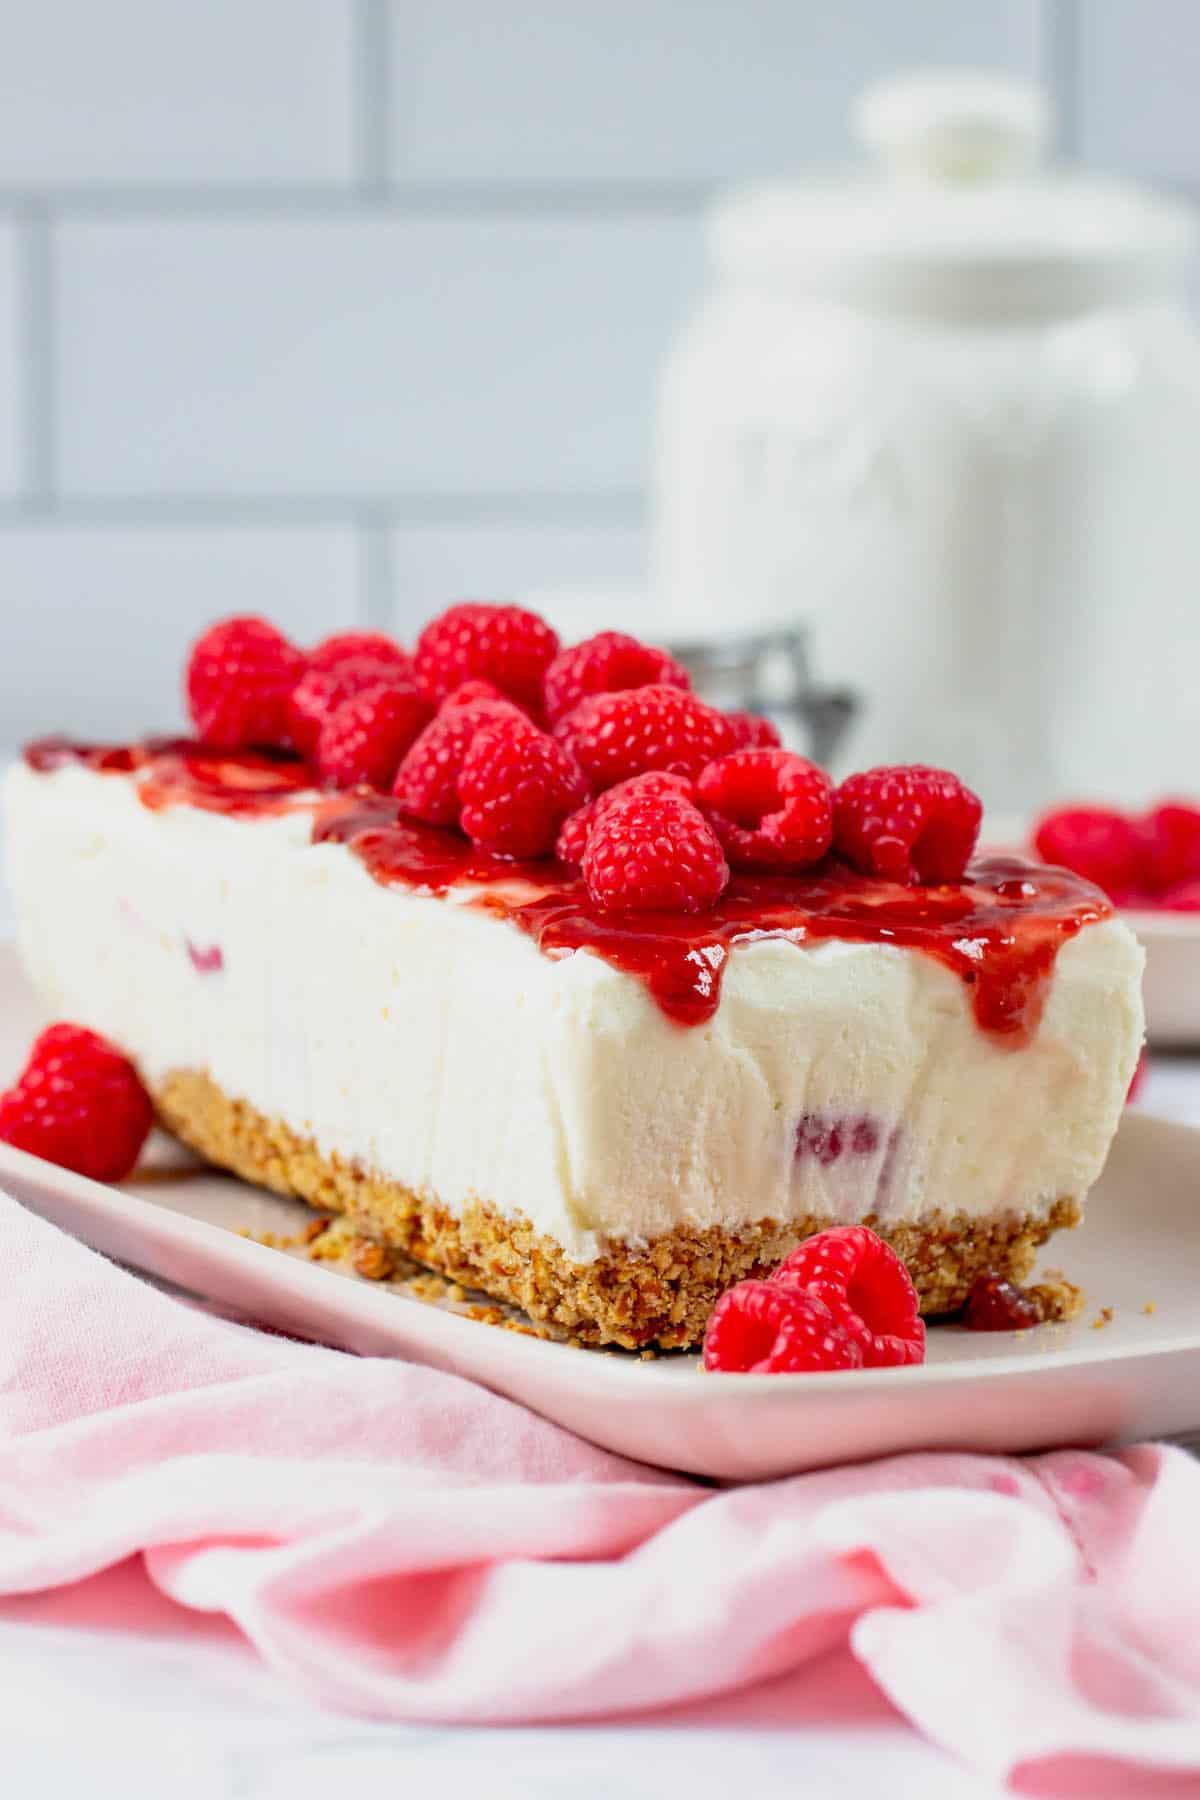 Frozen white chocolate raspberry dessert topped with fresh raspberries